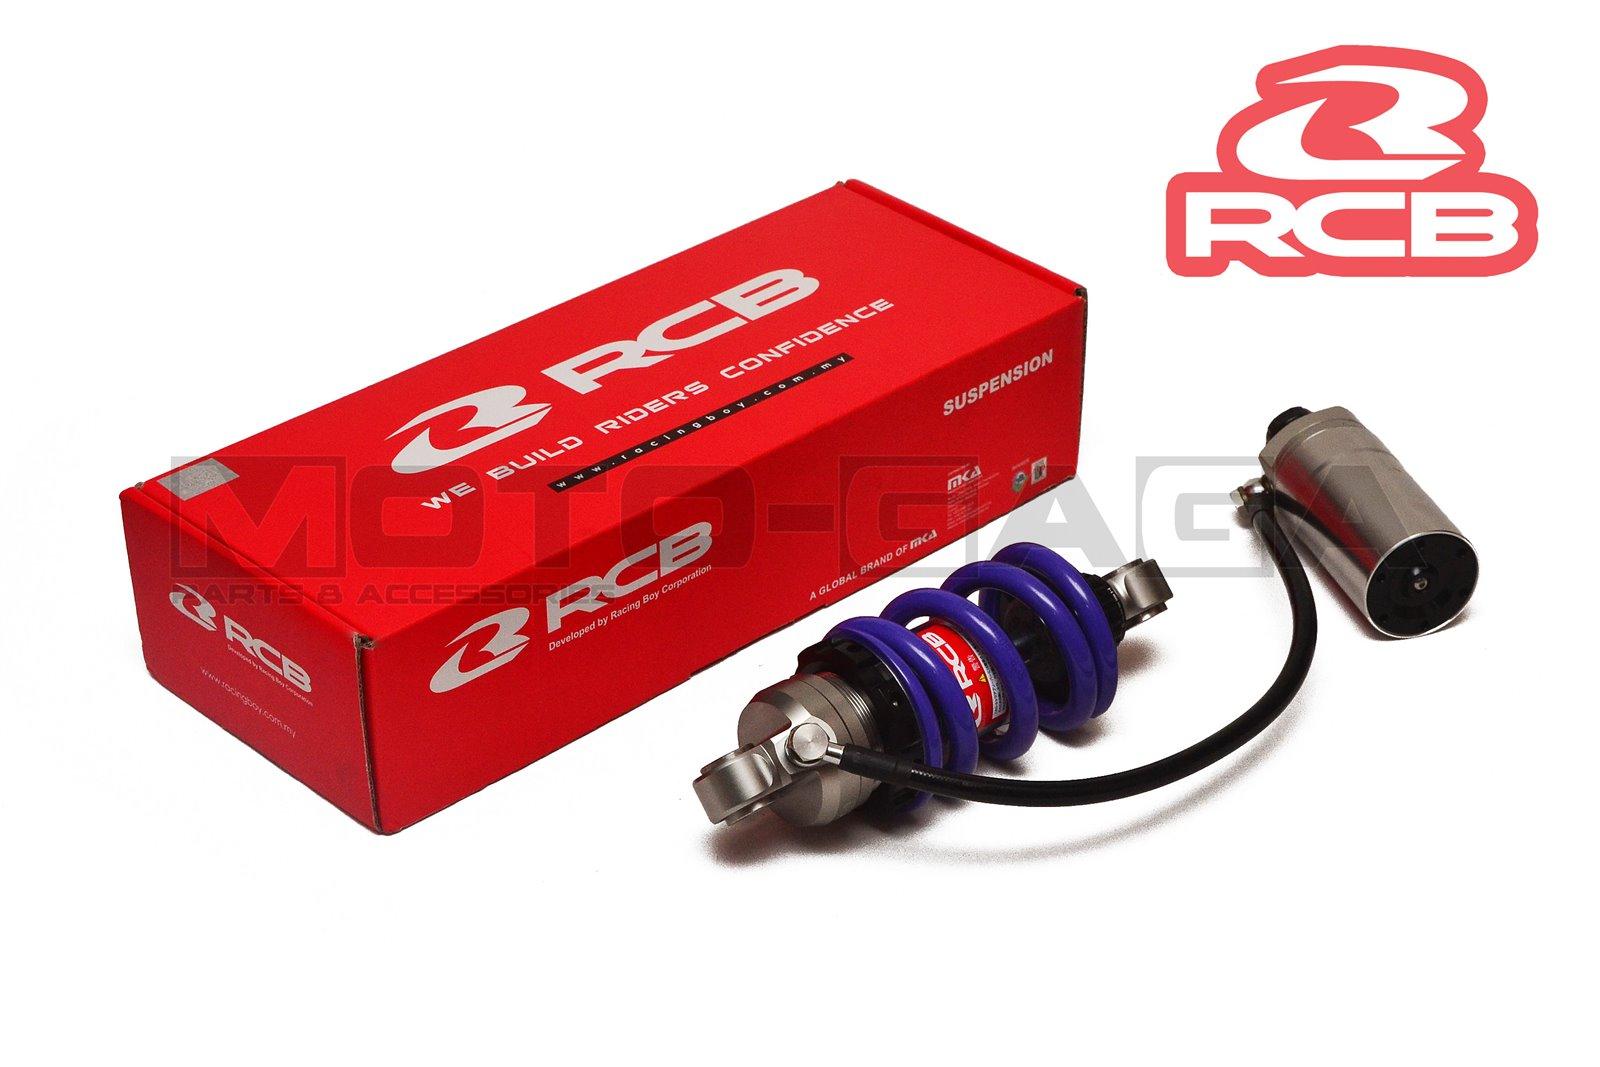 Racing Boy DB2 Adjustable Monoshock Absorber - Honda RS150R/Winner/Supra/Sonic